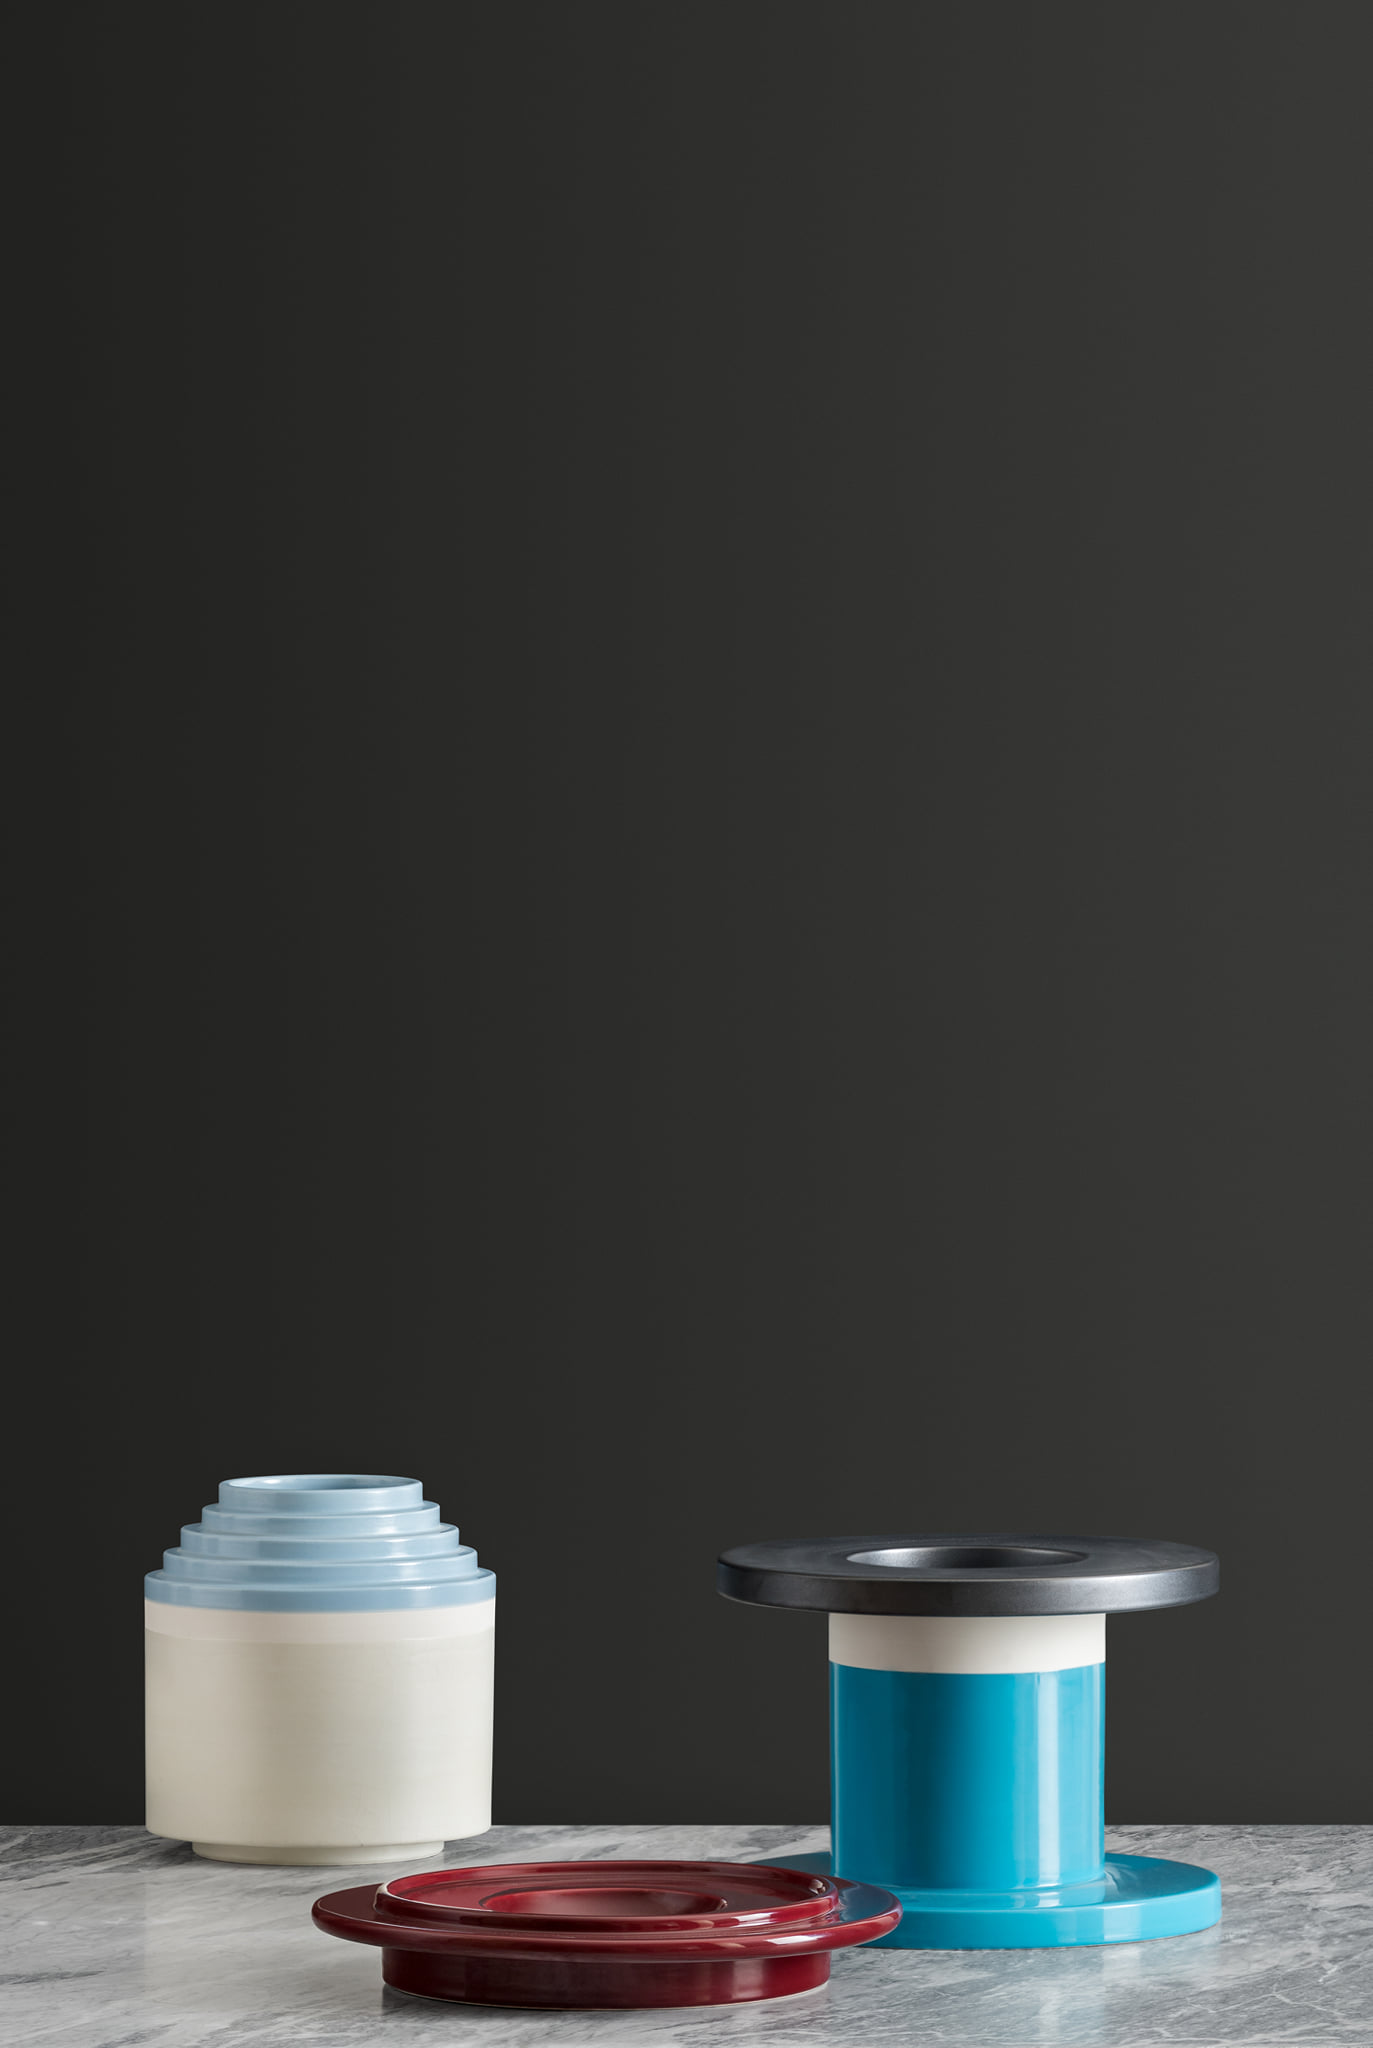 Two-Toned Glossy Turquoise Vase - Vase. Hand-turned in white clay. Two-tone glossy turquoise and matt oxidised copper glaze. | Matter of Stuff